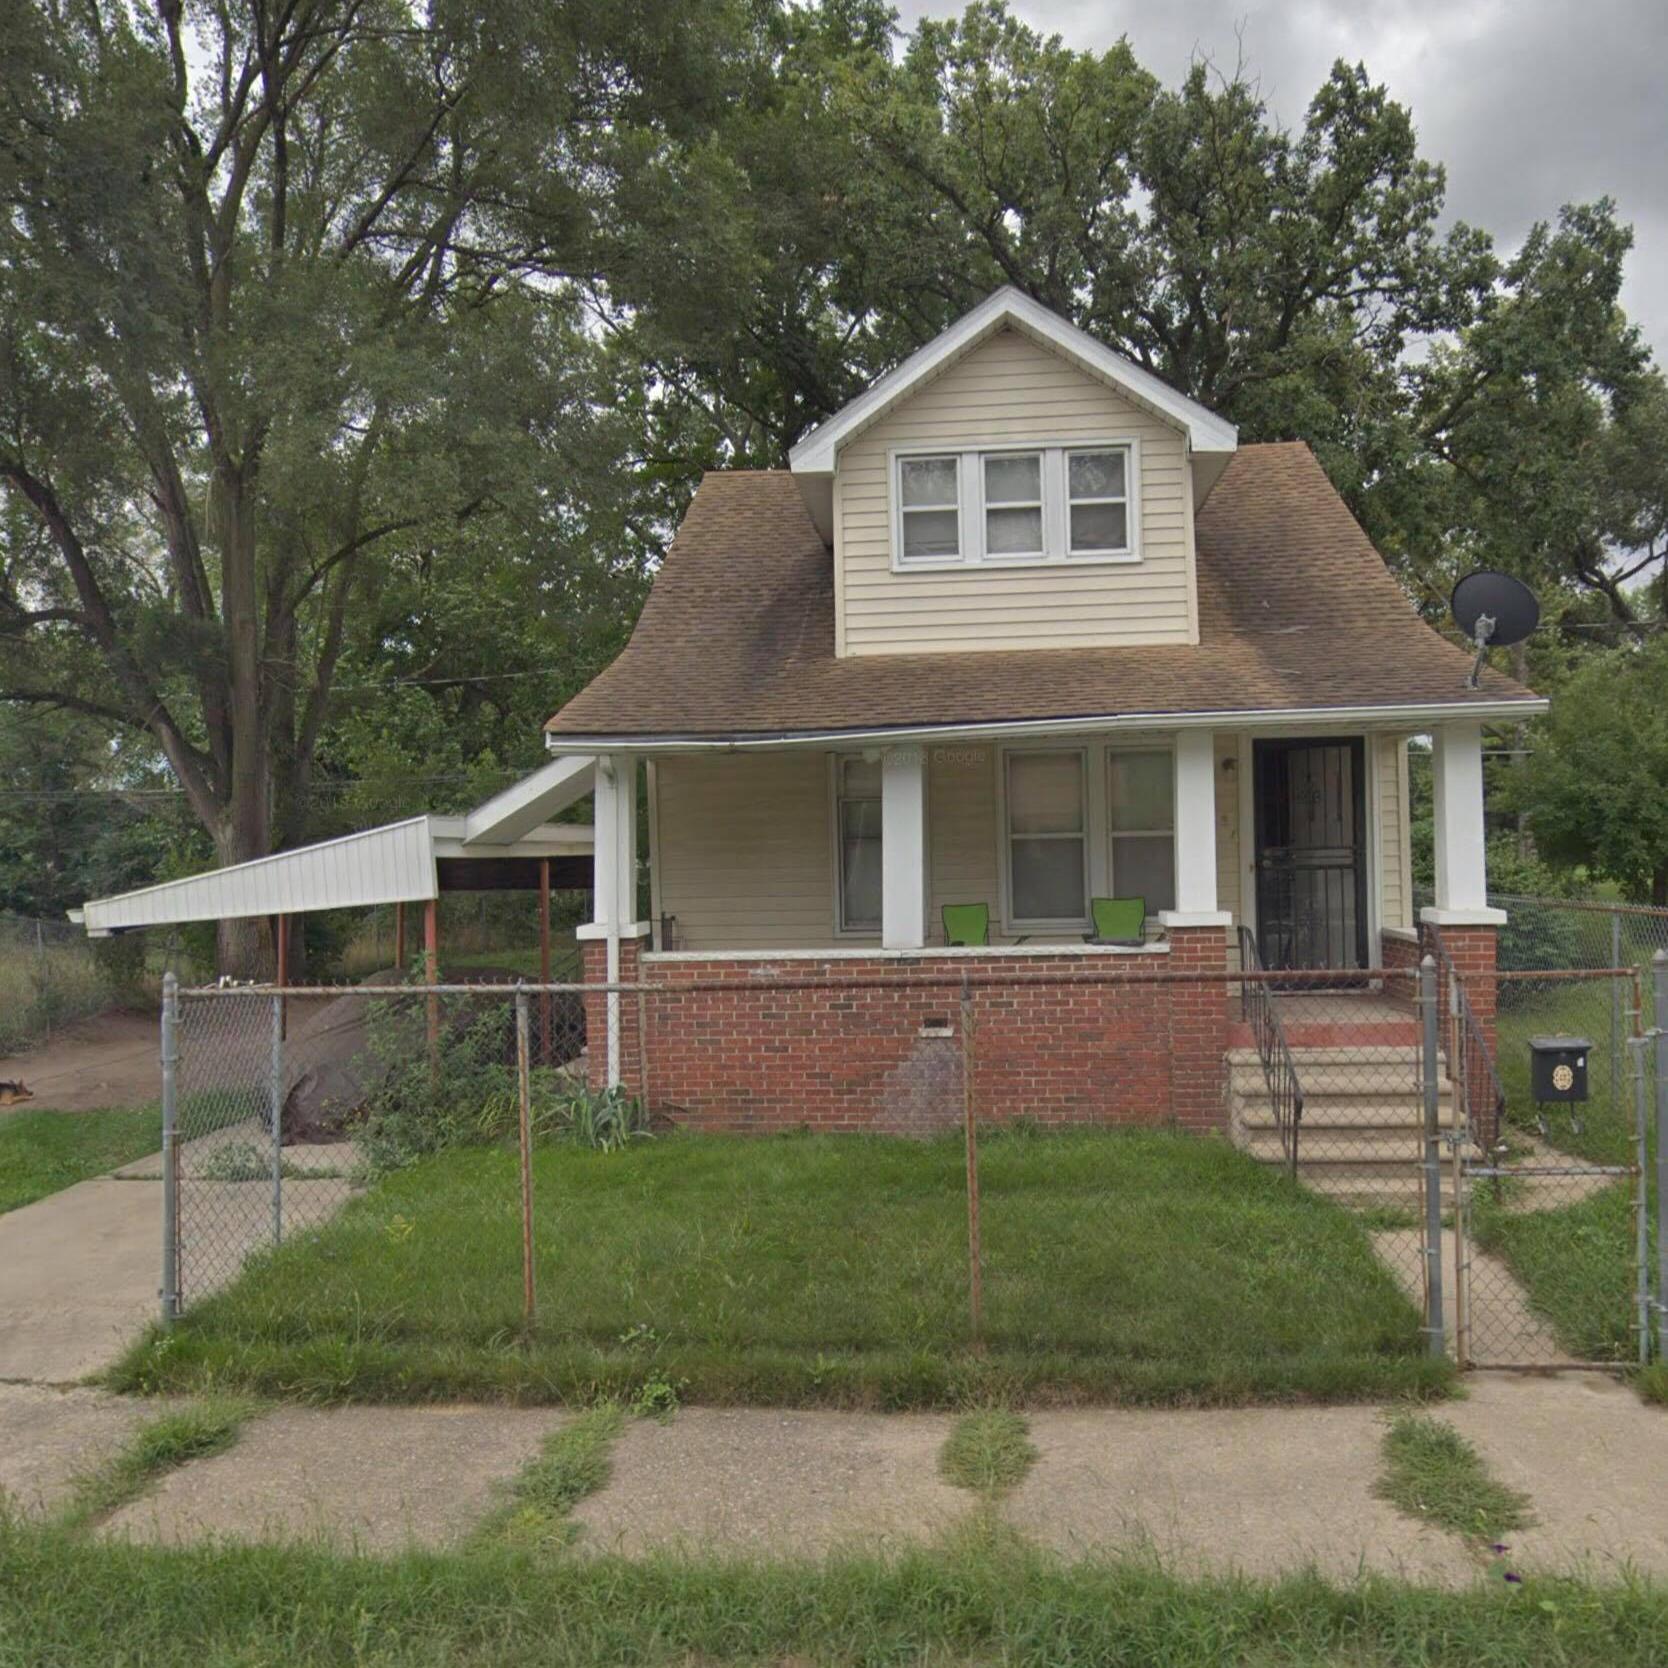 The Karr family home in 1930 at 8551 Ellsworth Avenue, Detroit